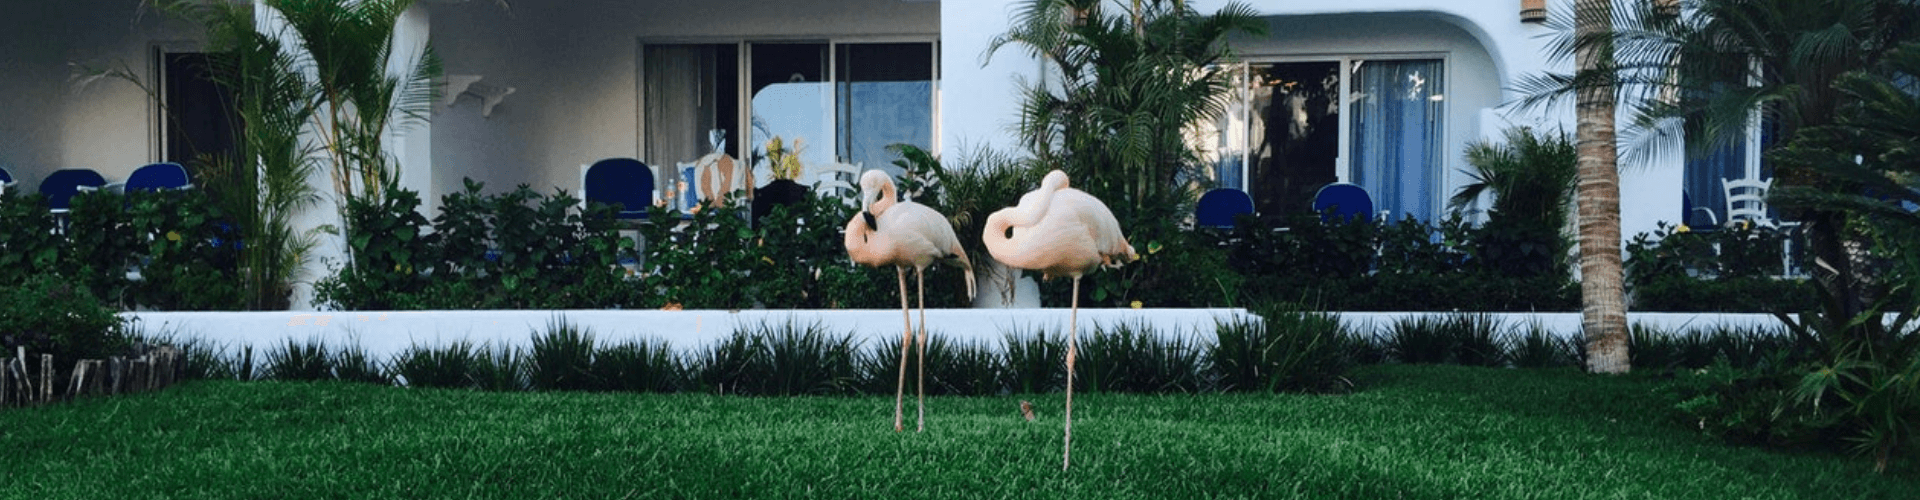 backyard trends 2019